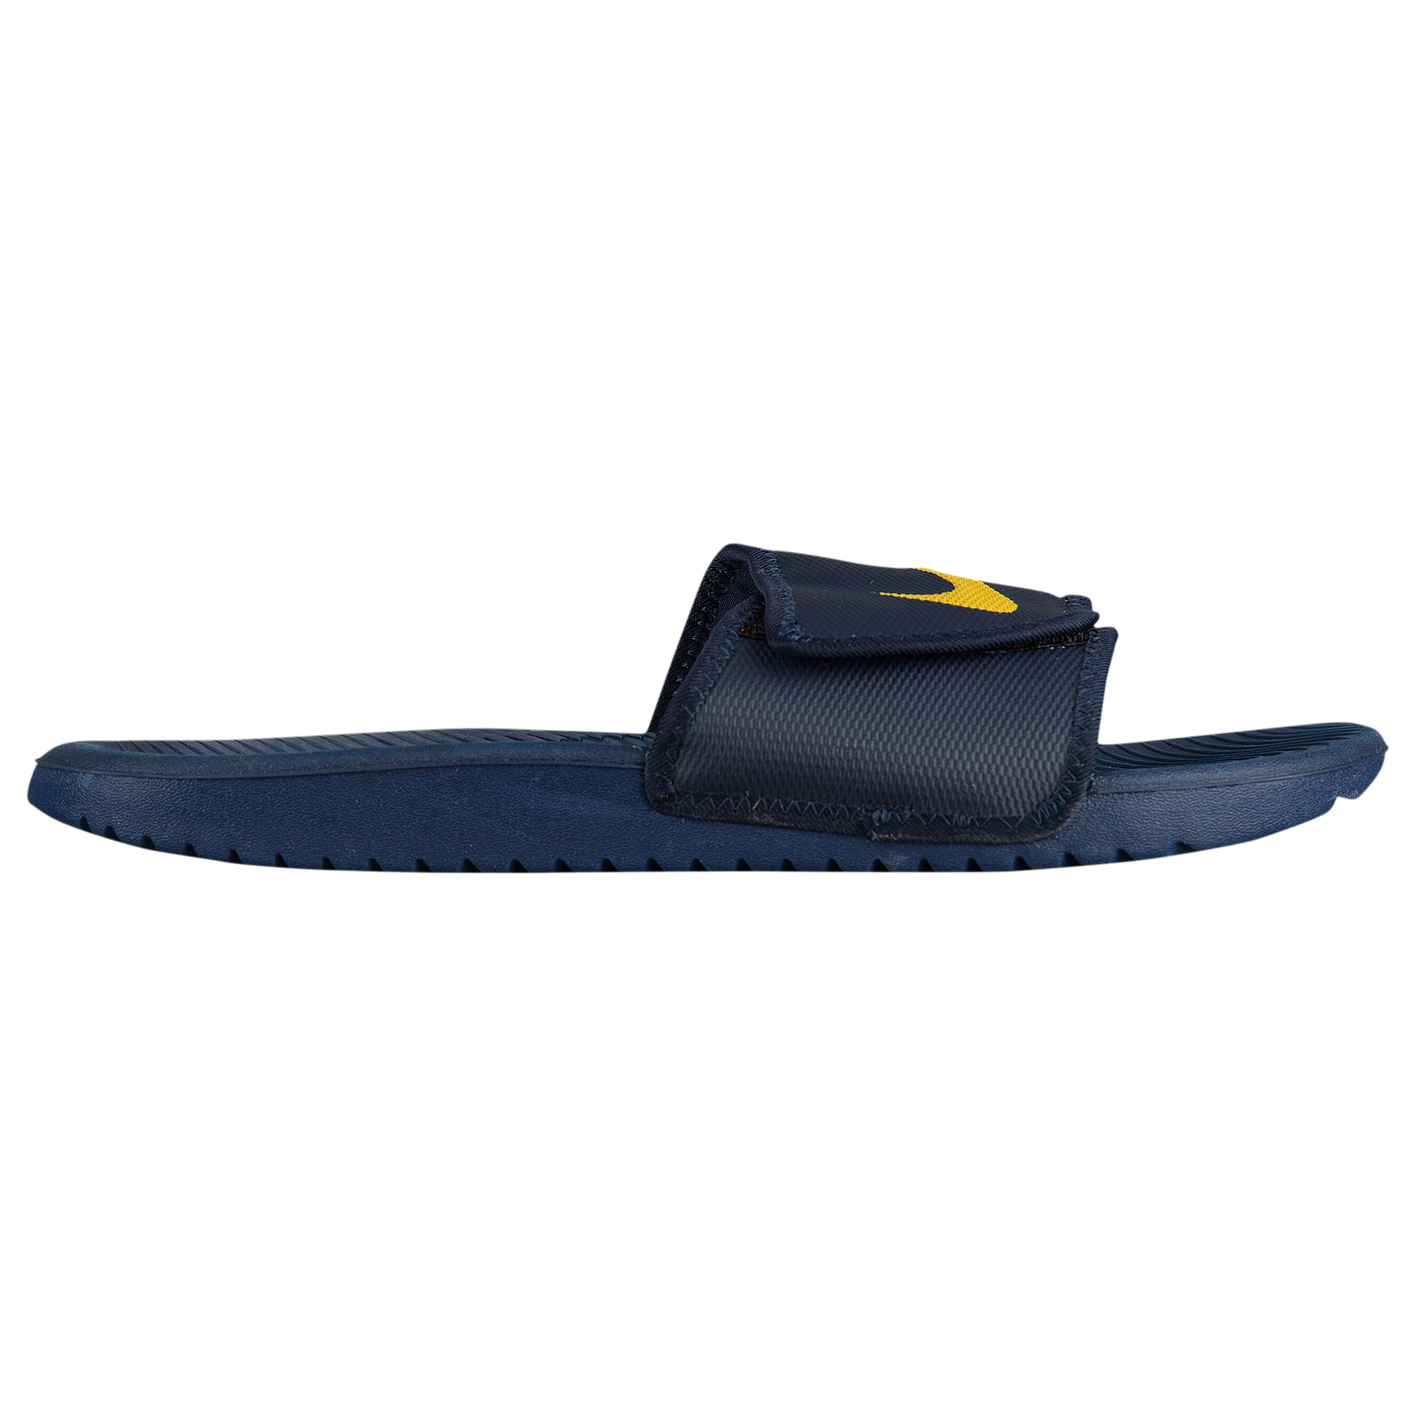 21877d51abf1 Nike Kawa Adjust Slide - Men s - Casual - Shoes - Obsidian Mineral ...